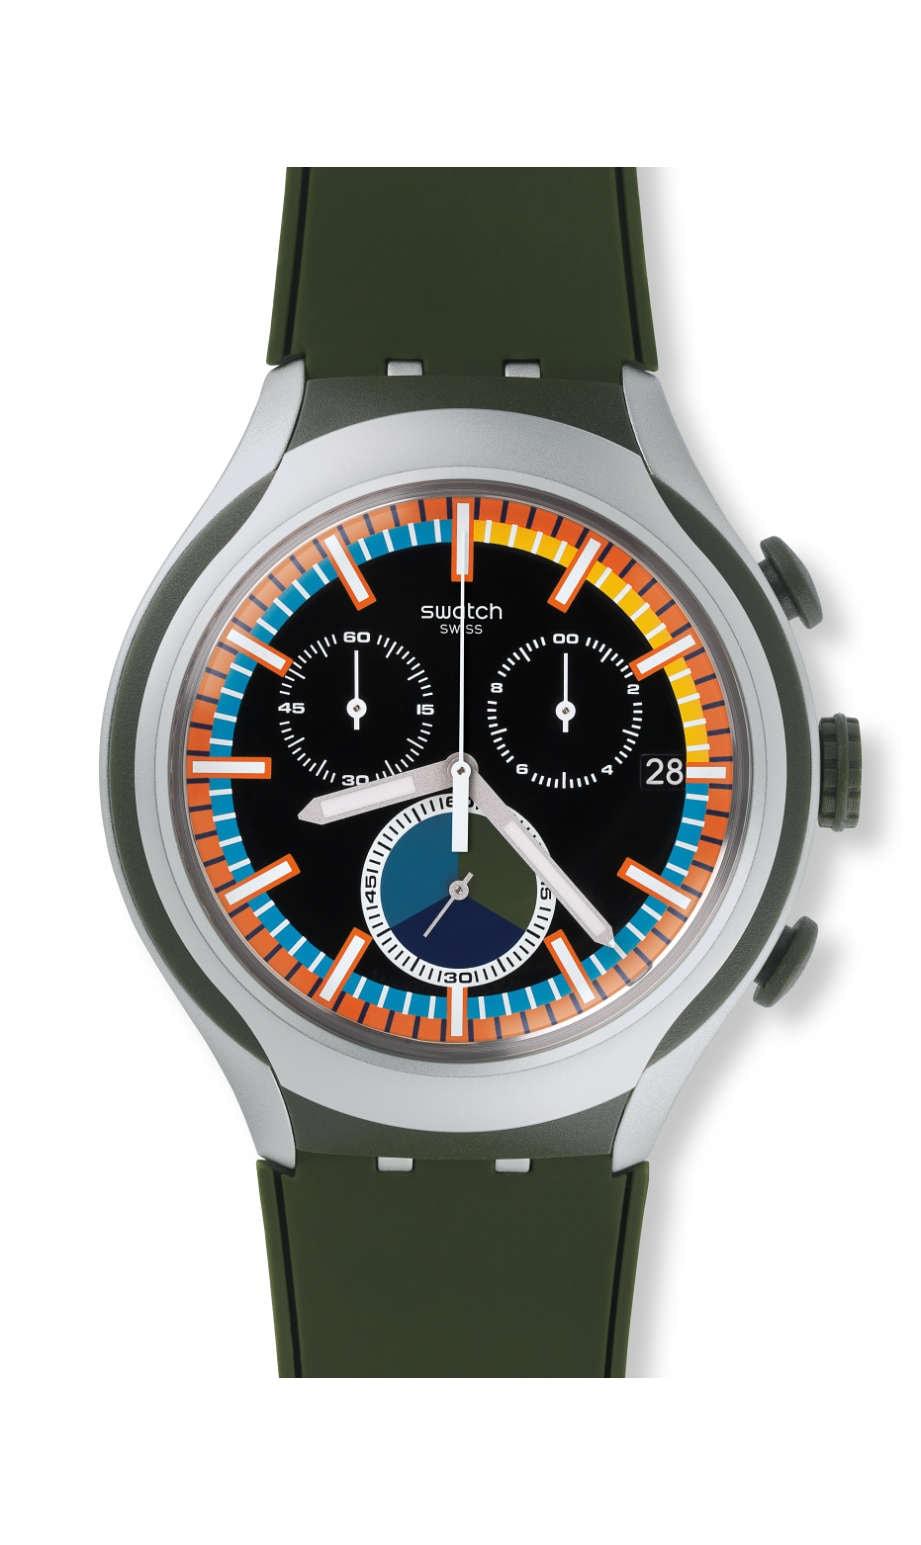 Swatch - MOSS - 1